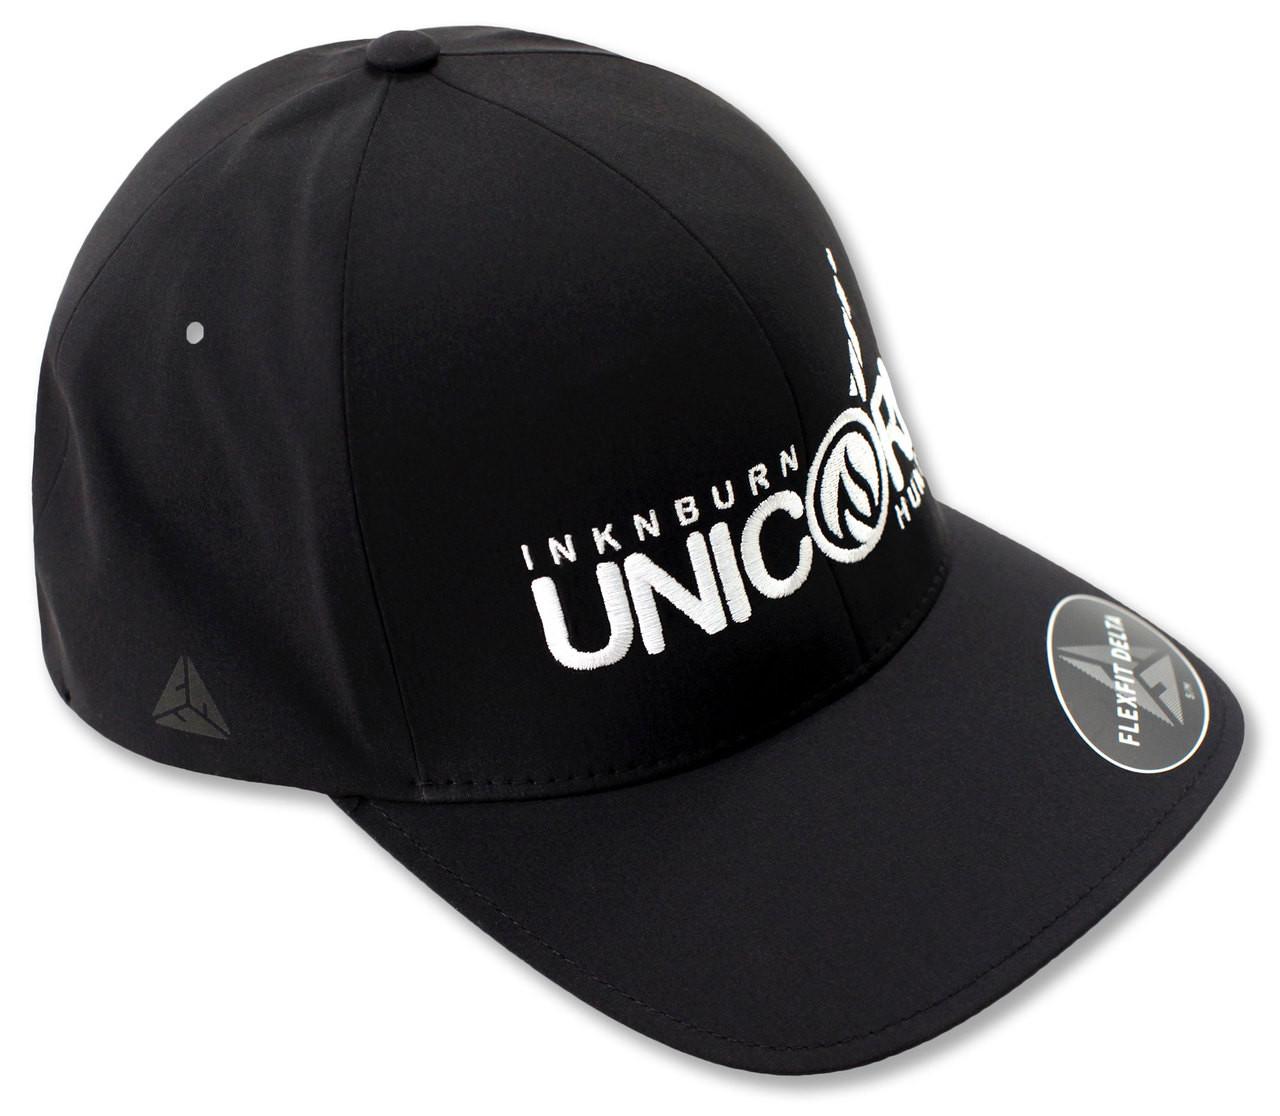 INKnBURN Unicorn Hunter Hat